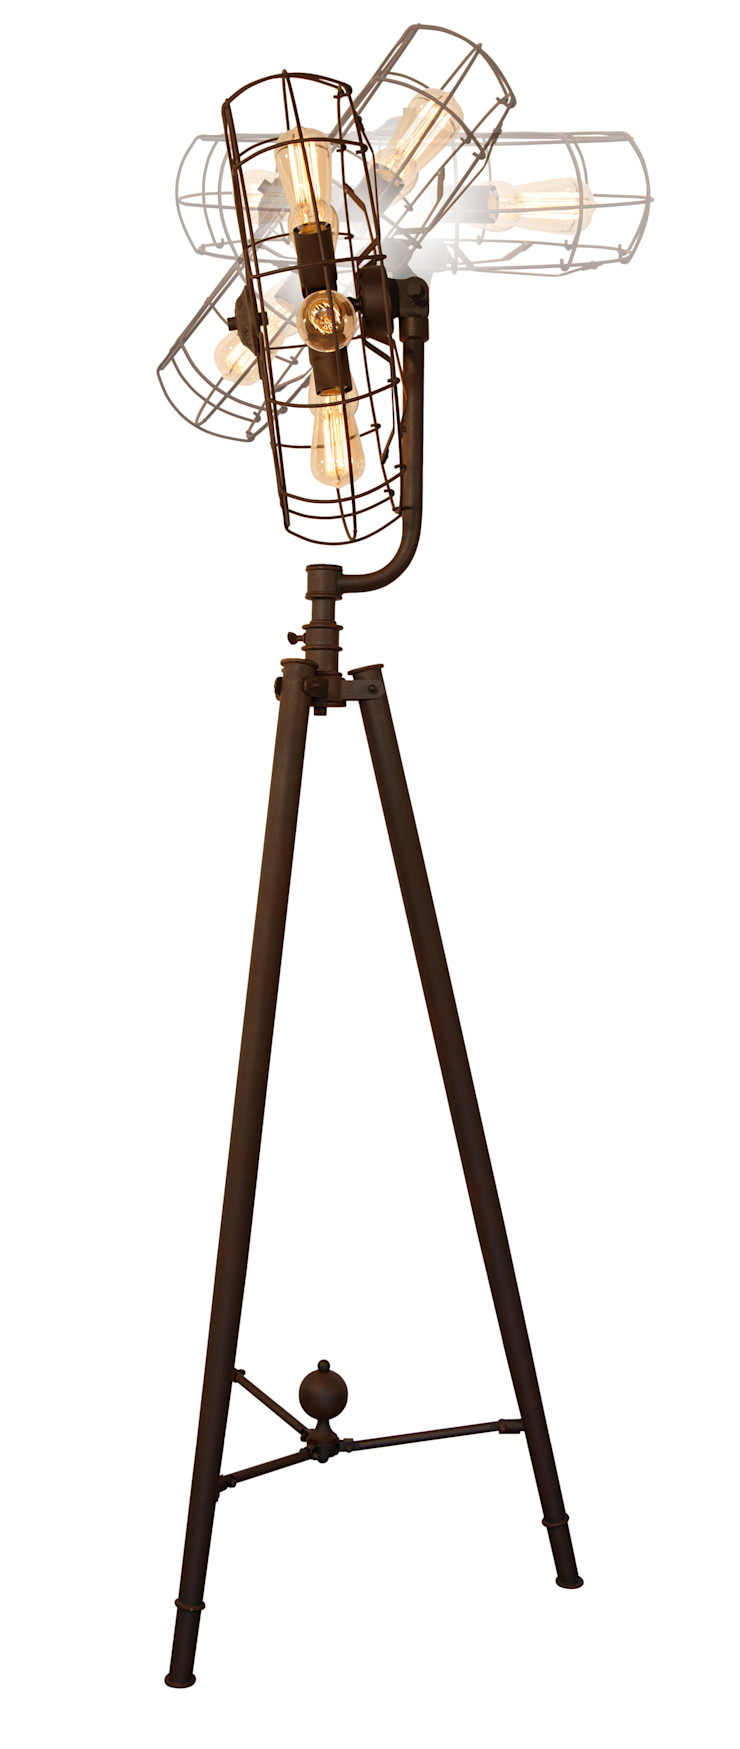 ROMA LOFT NO. 3-FLOOR LAMP Altavola Design Sp. z o.o. Living roomLighting